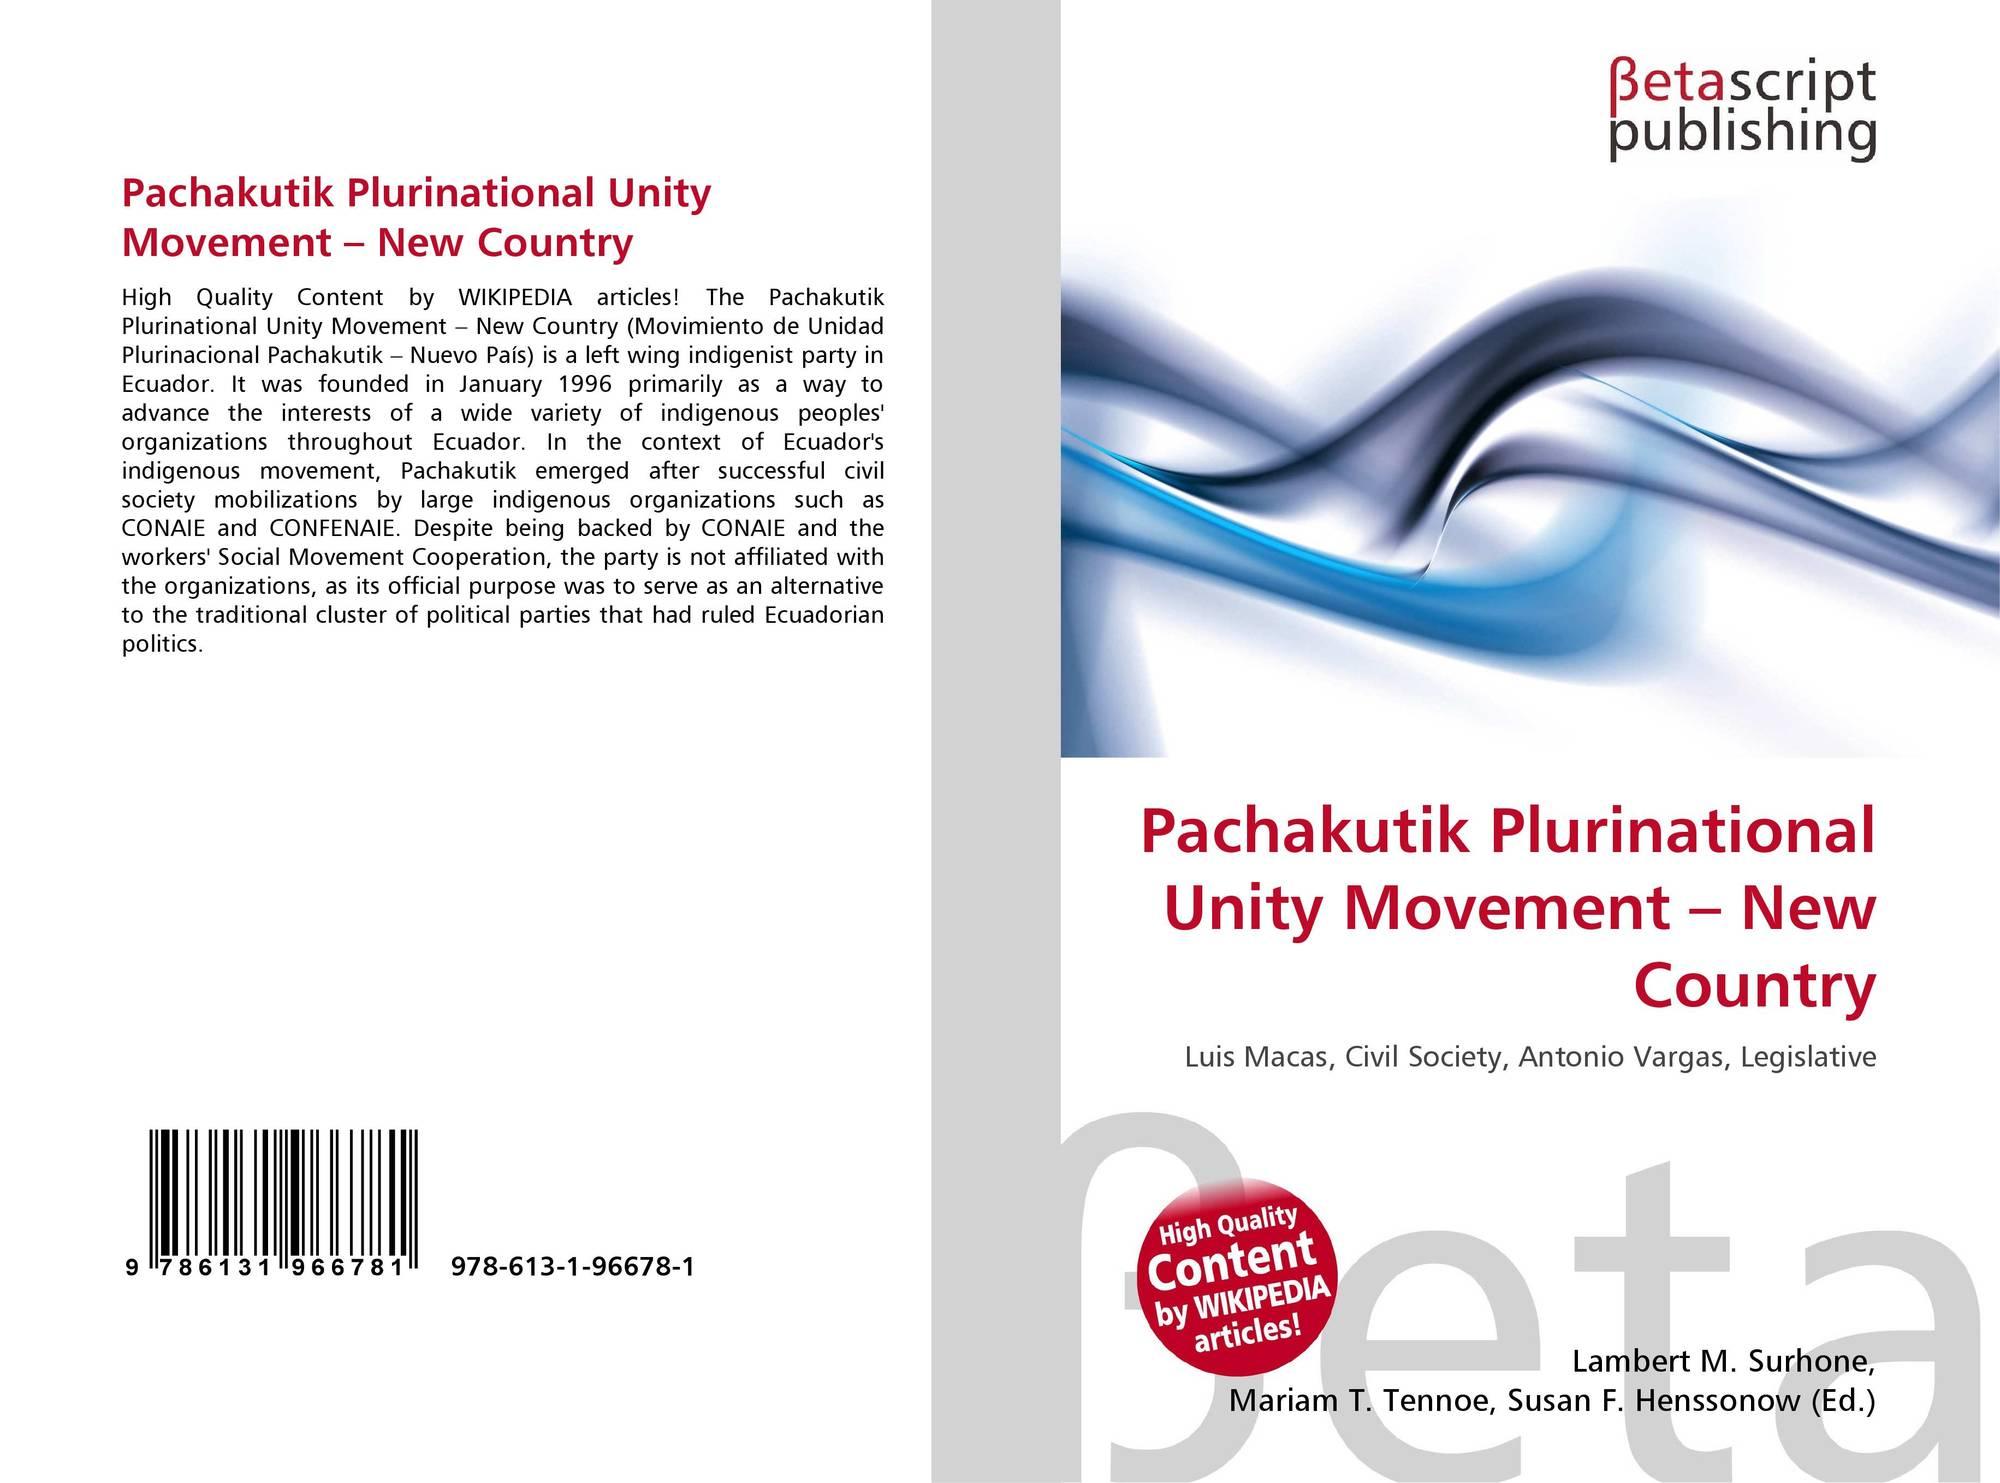 Pachakutik Plurinational Unity Movement – New Country, 978